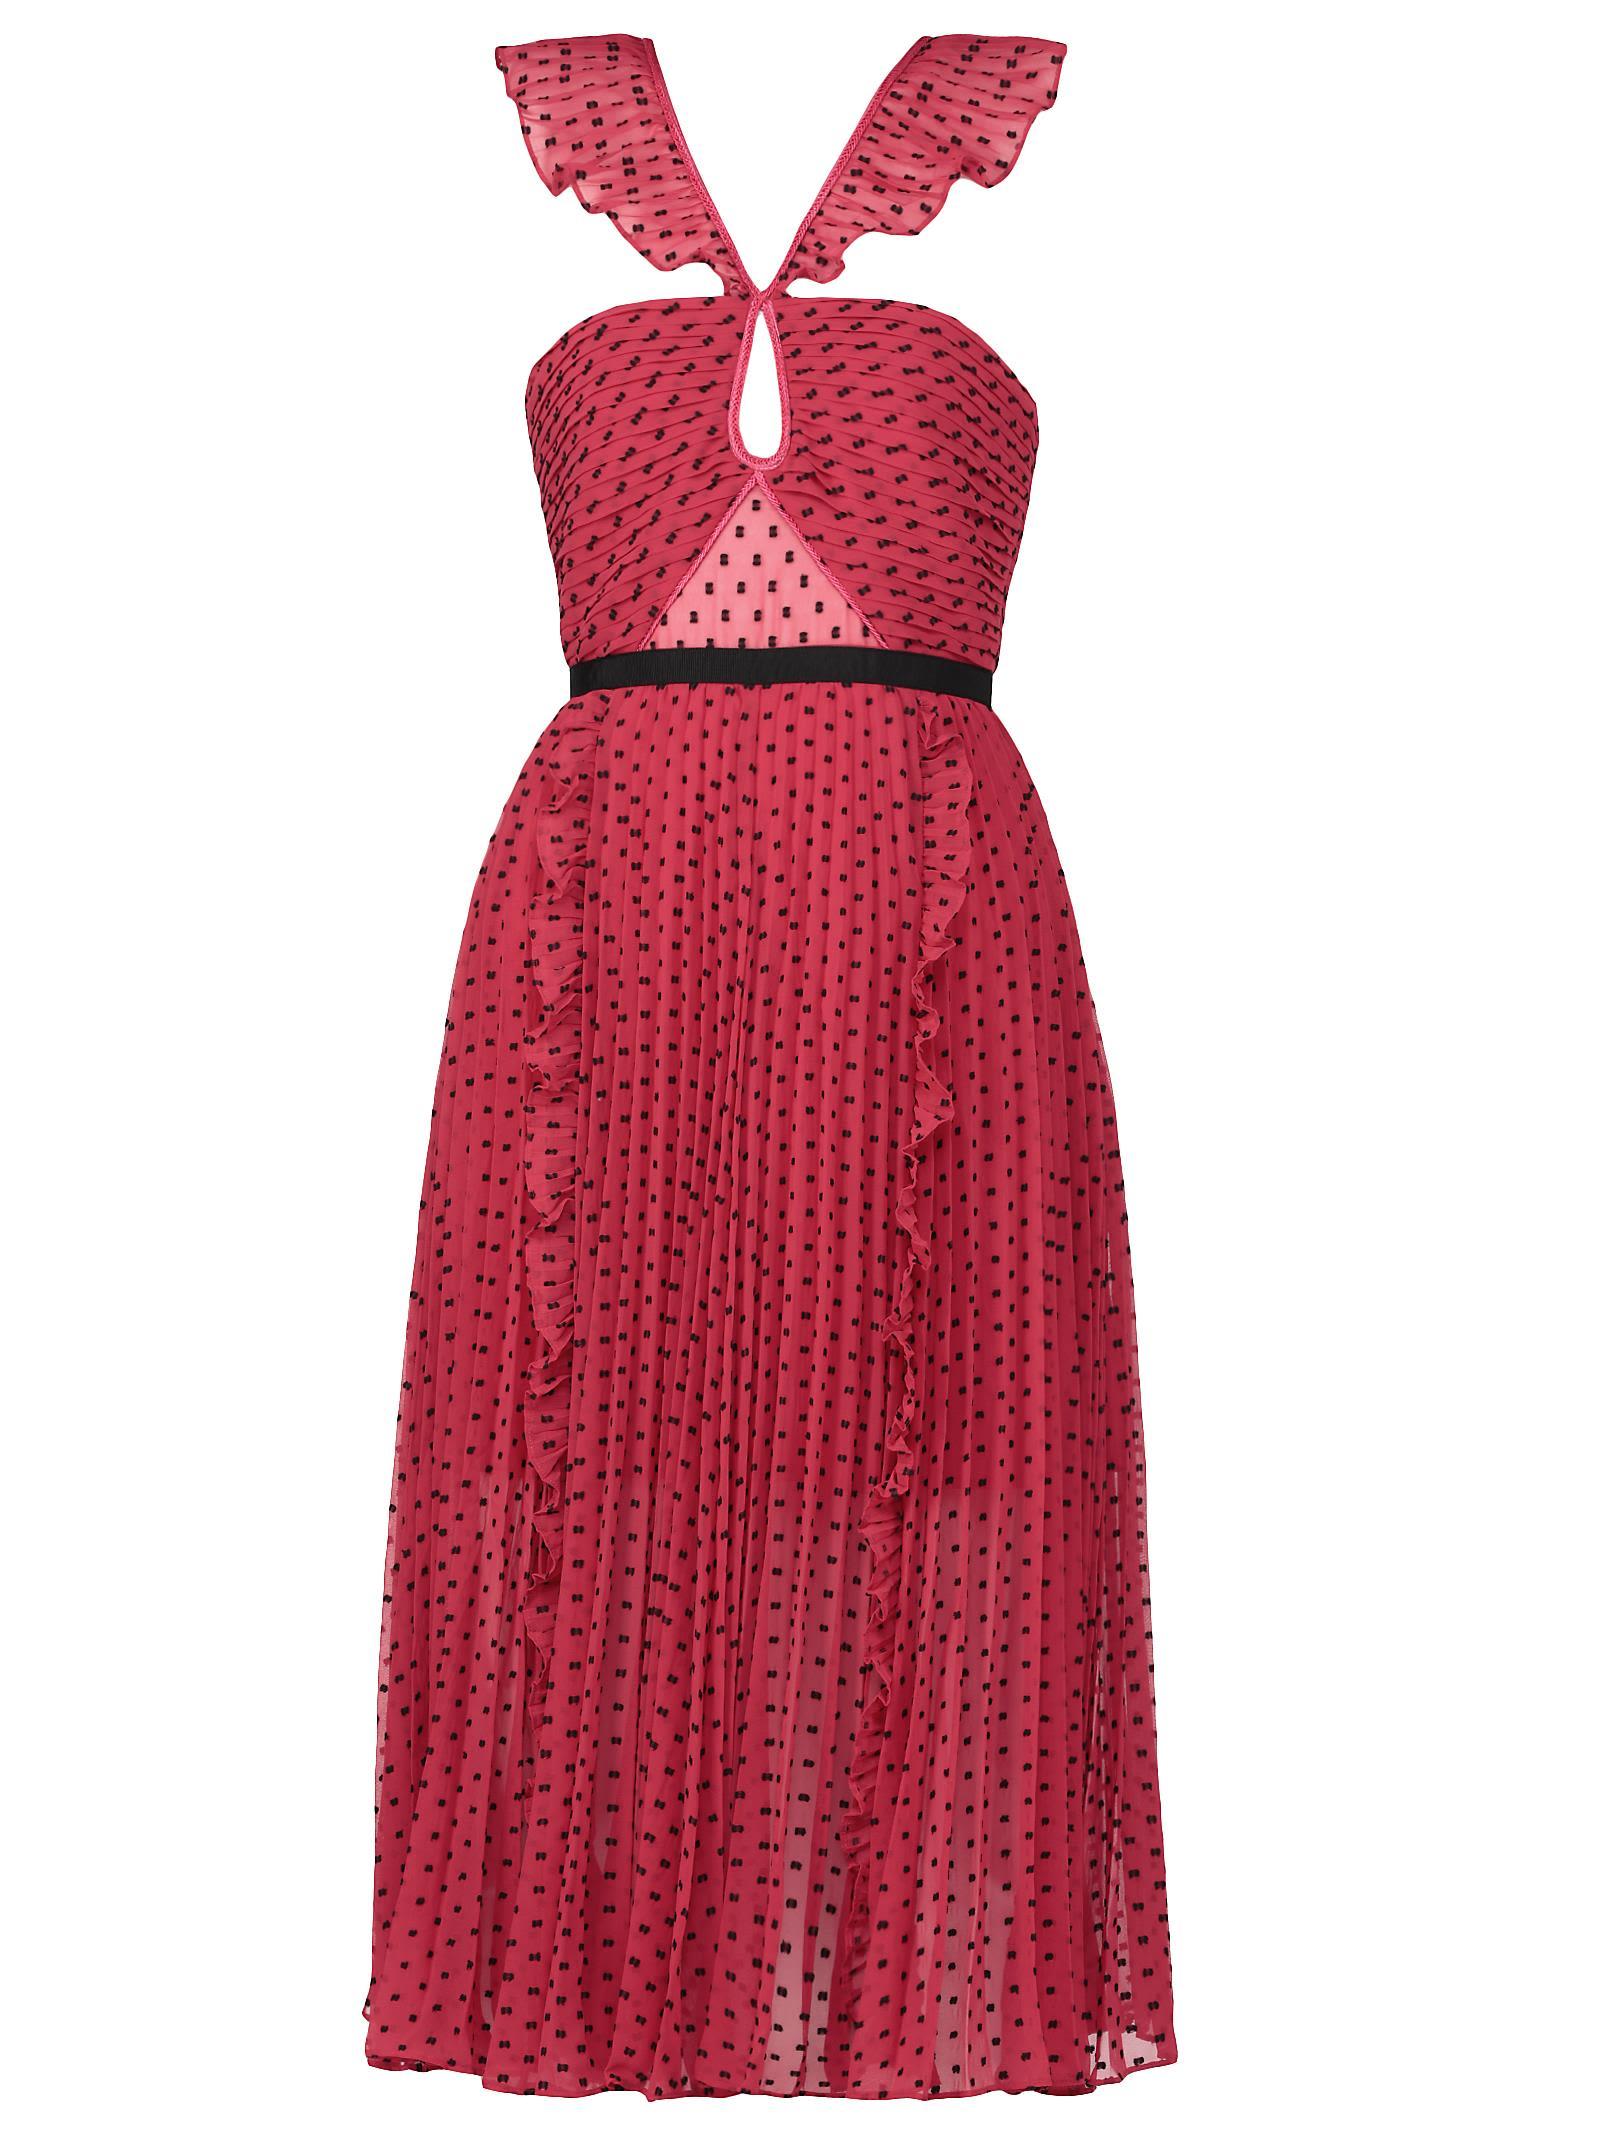 self-portrait Polka Dots Dress